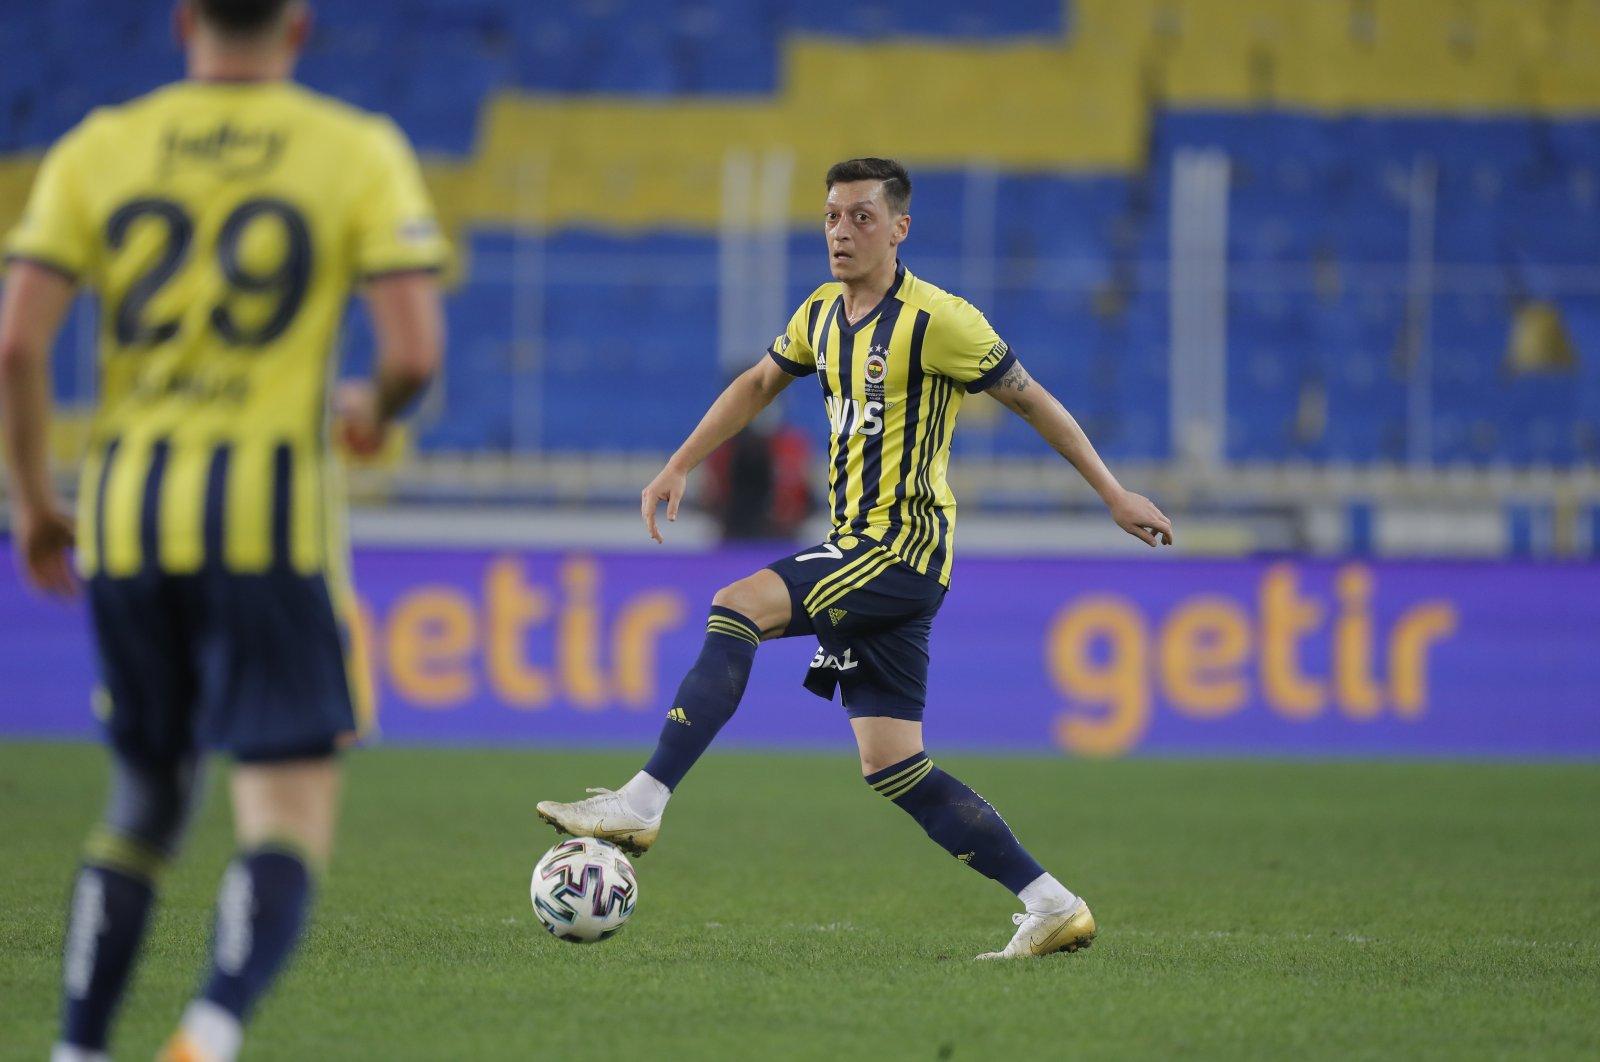 Fenerbahçe's Mesut Özil in action during a Süper Lig match against Galatasaray in Istanbul, Turkey, Feb. 6, 2021. (AP Photo)